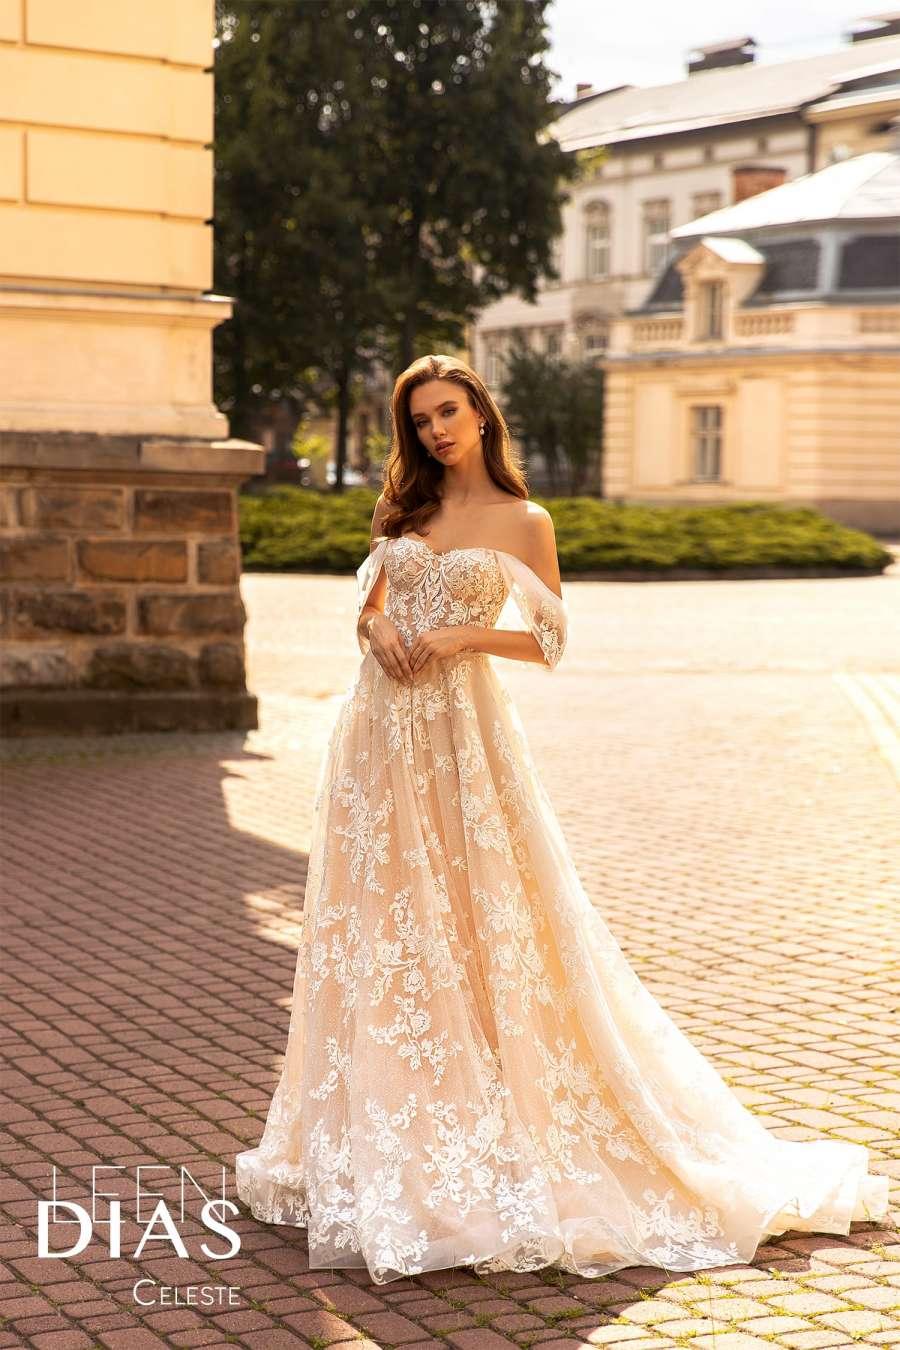 свадебное платье А - силуэт Celeste-1.900x900w